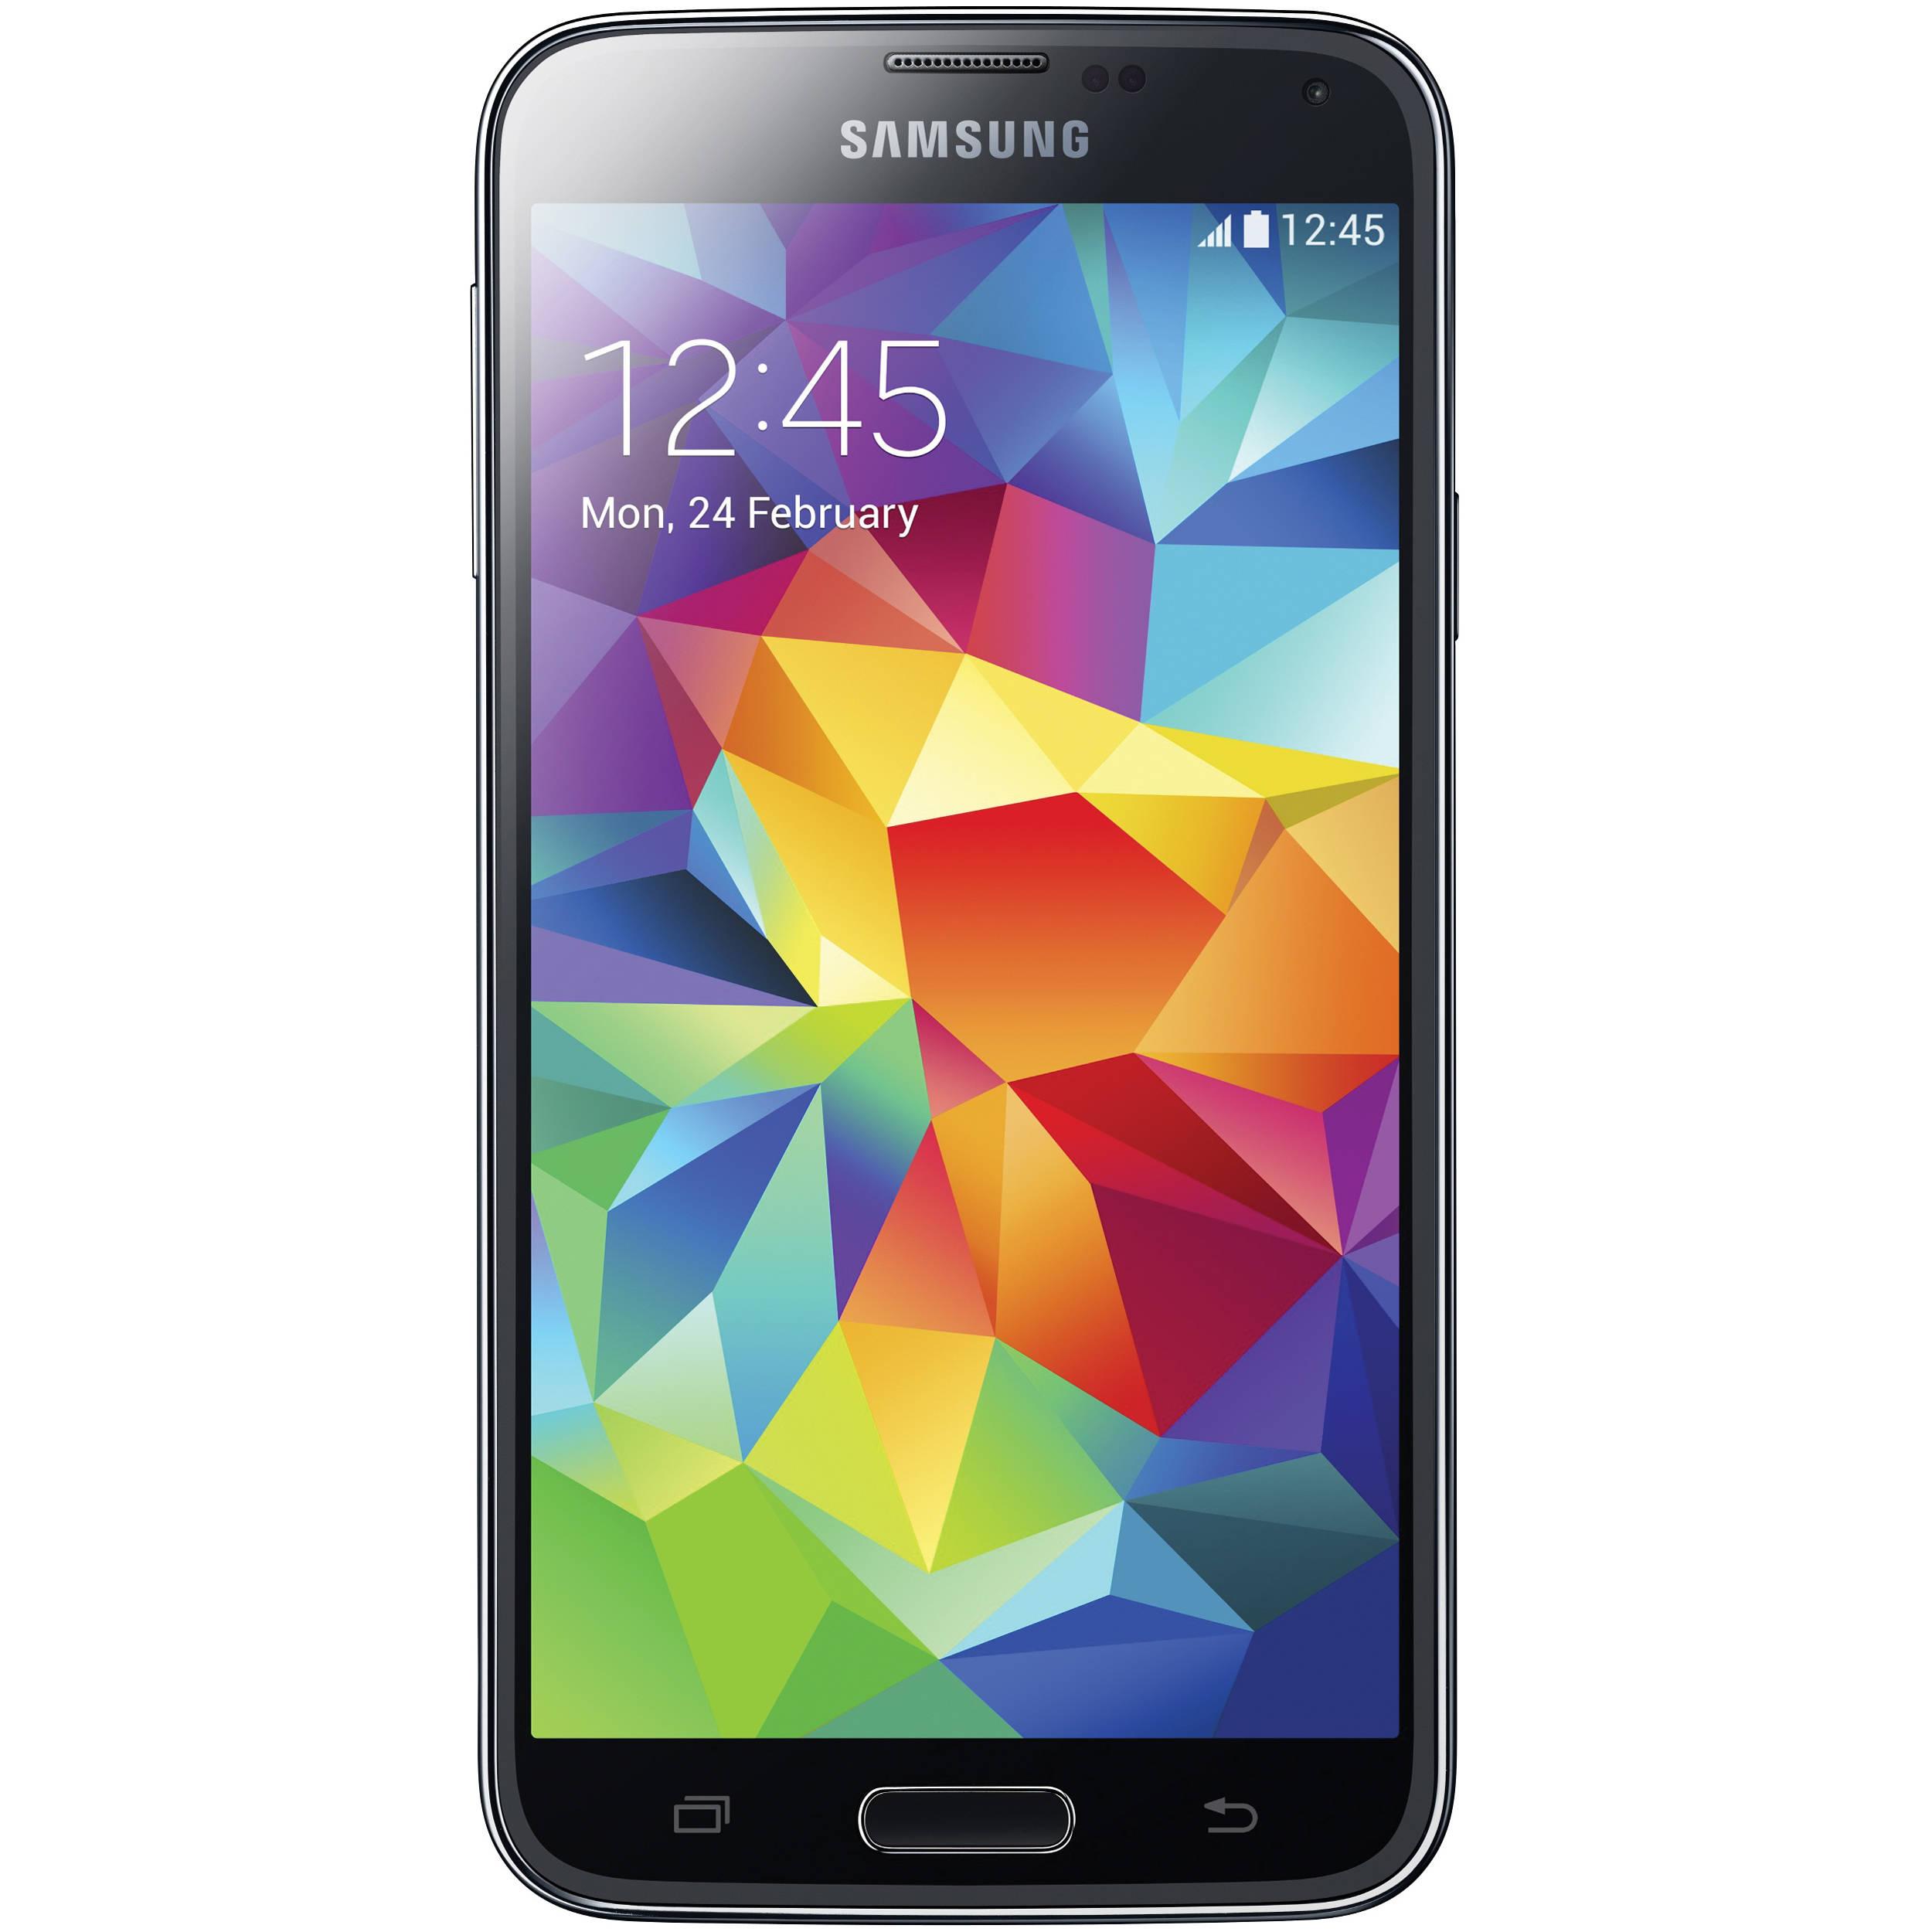 Samsung Galaxy S5 Mini Sim Karte.Samsung Galaxy S5 Sm G900f 16gb Smartphone Unlocked Black